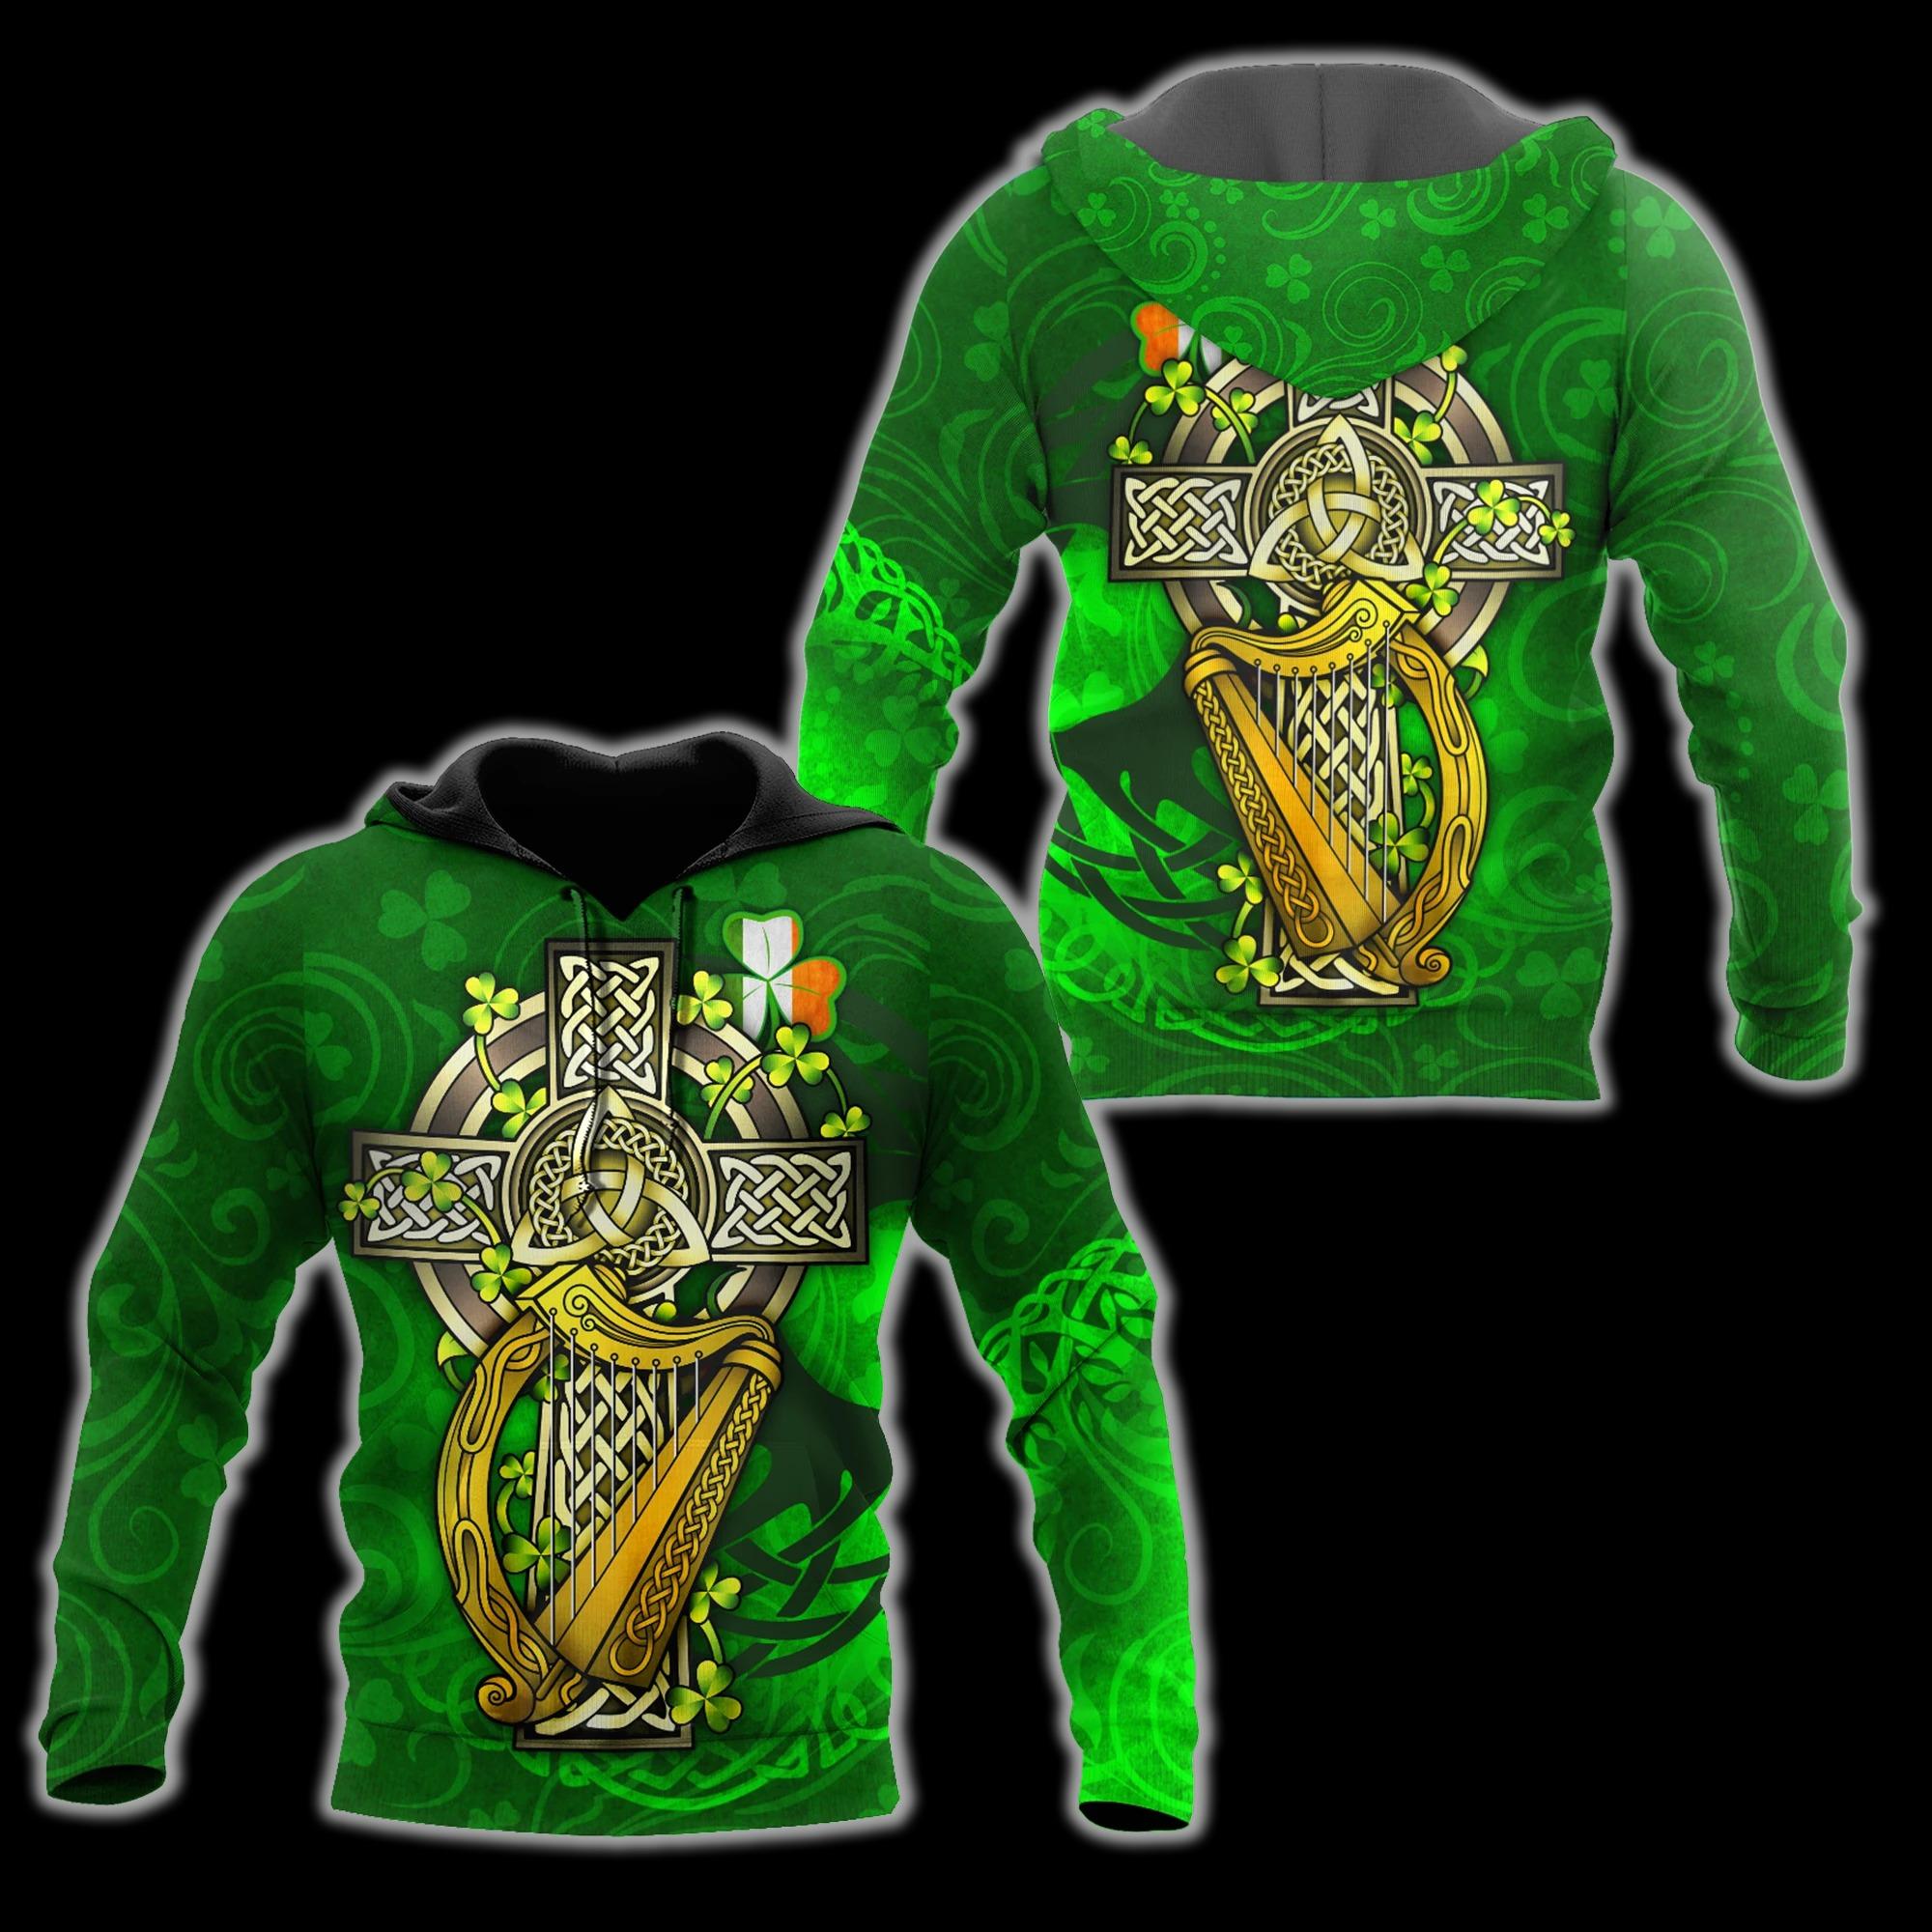 Irish Harp 3D All Over Printed Hoodie And Shirts